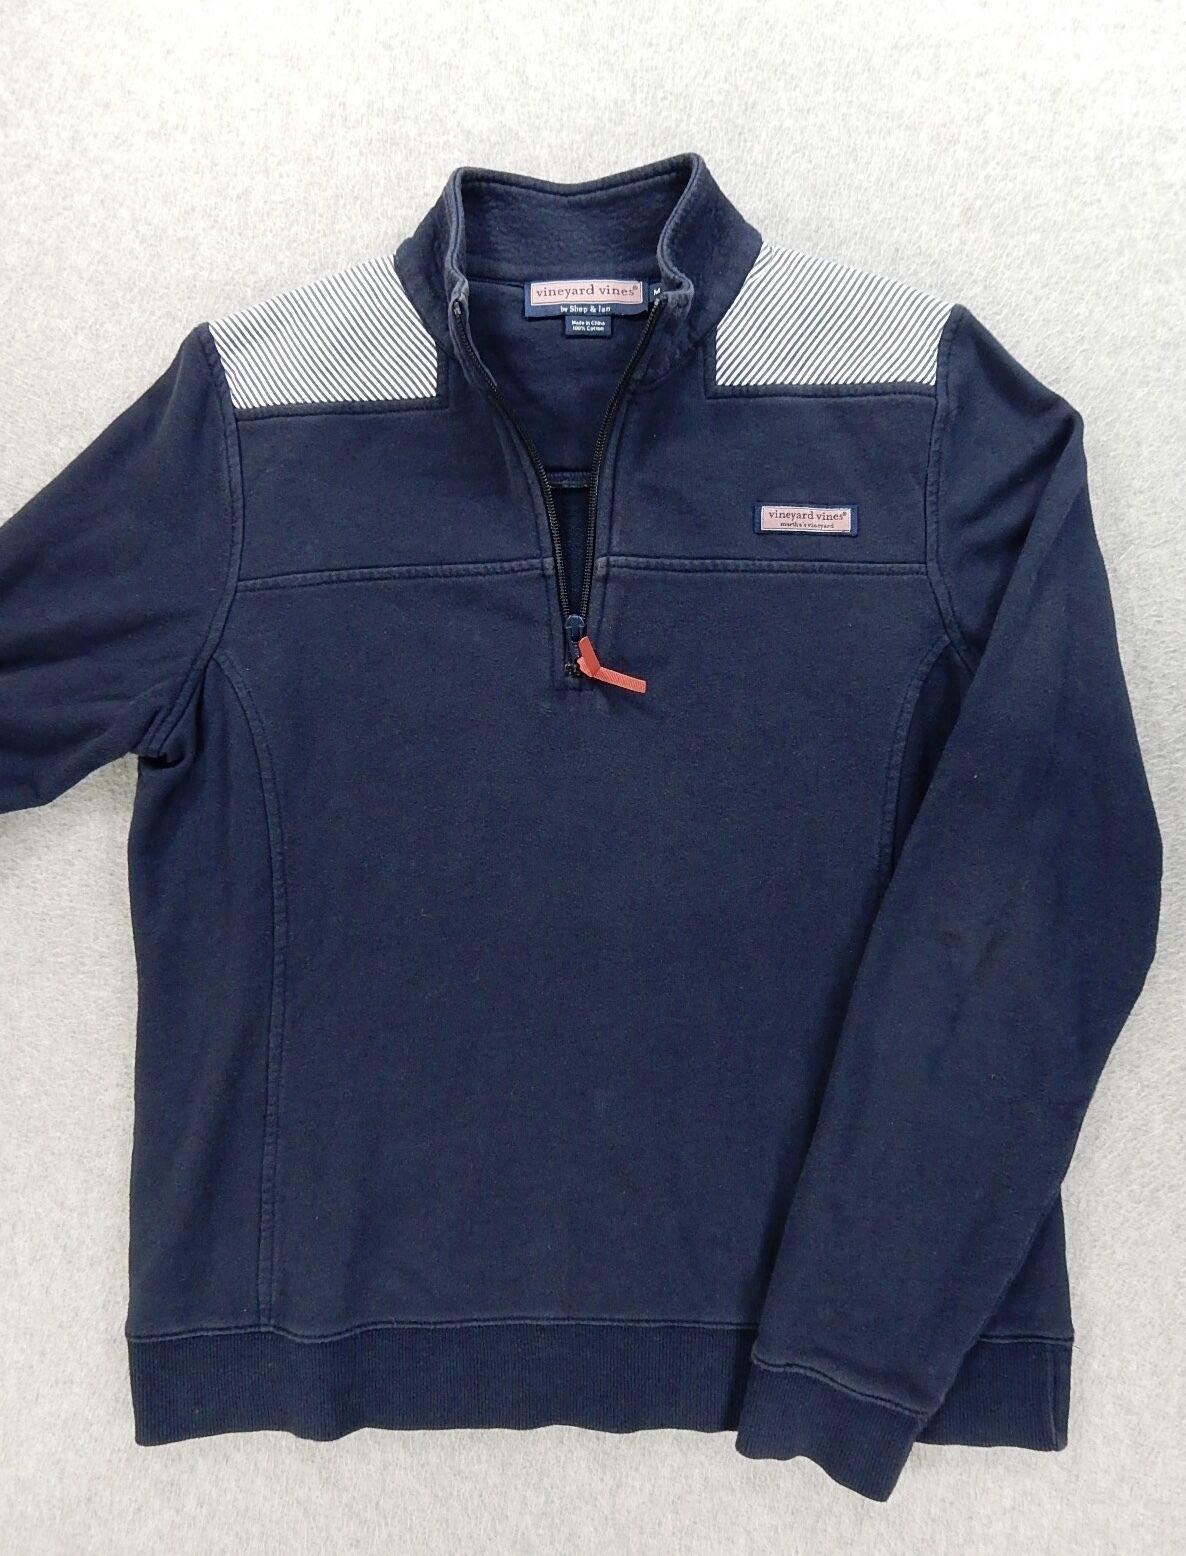 Vineyard Vines Oxford Stripe 1 4 Zip Shep Shirt (Womens Medium) bluee